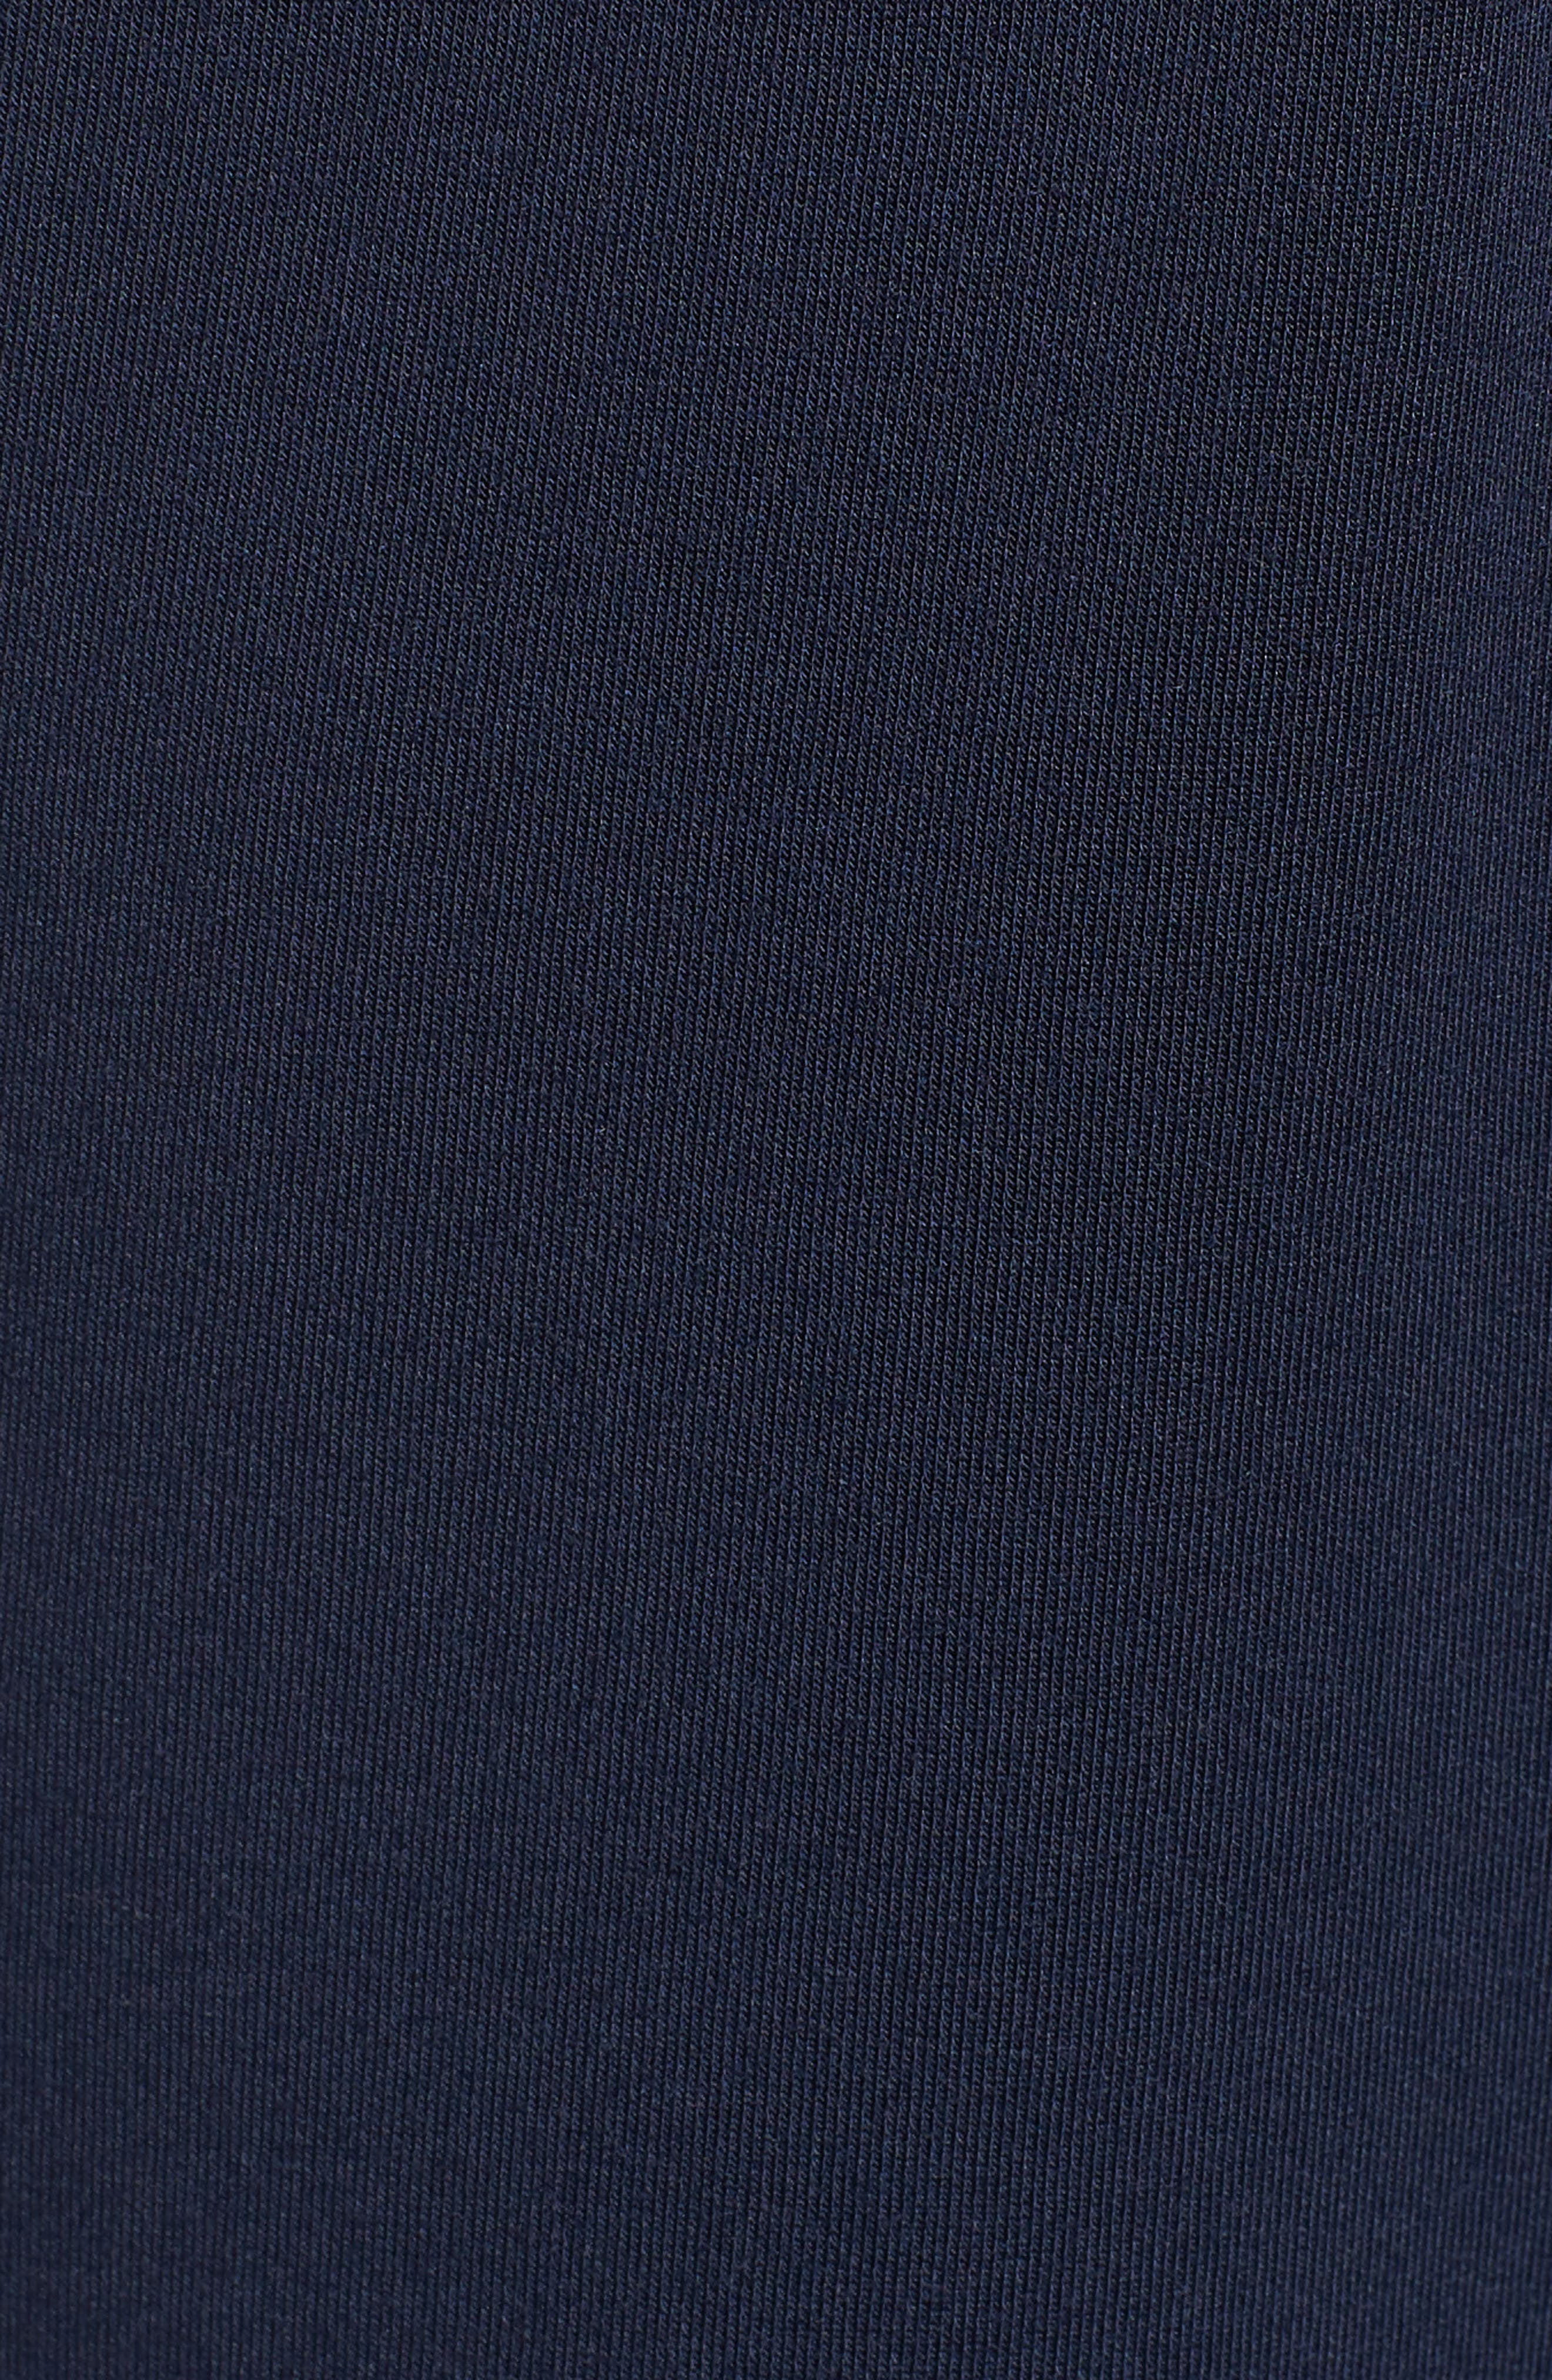 Modal Blend Lounge Shorts,                             Alternate thumbnail 5, color,                             NAVY